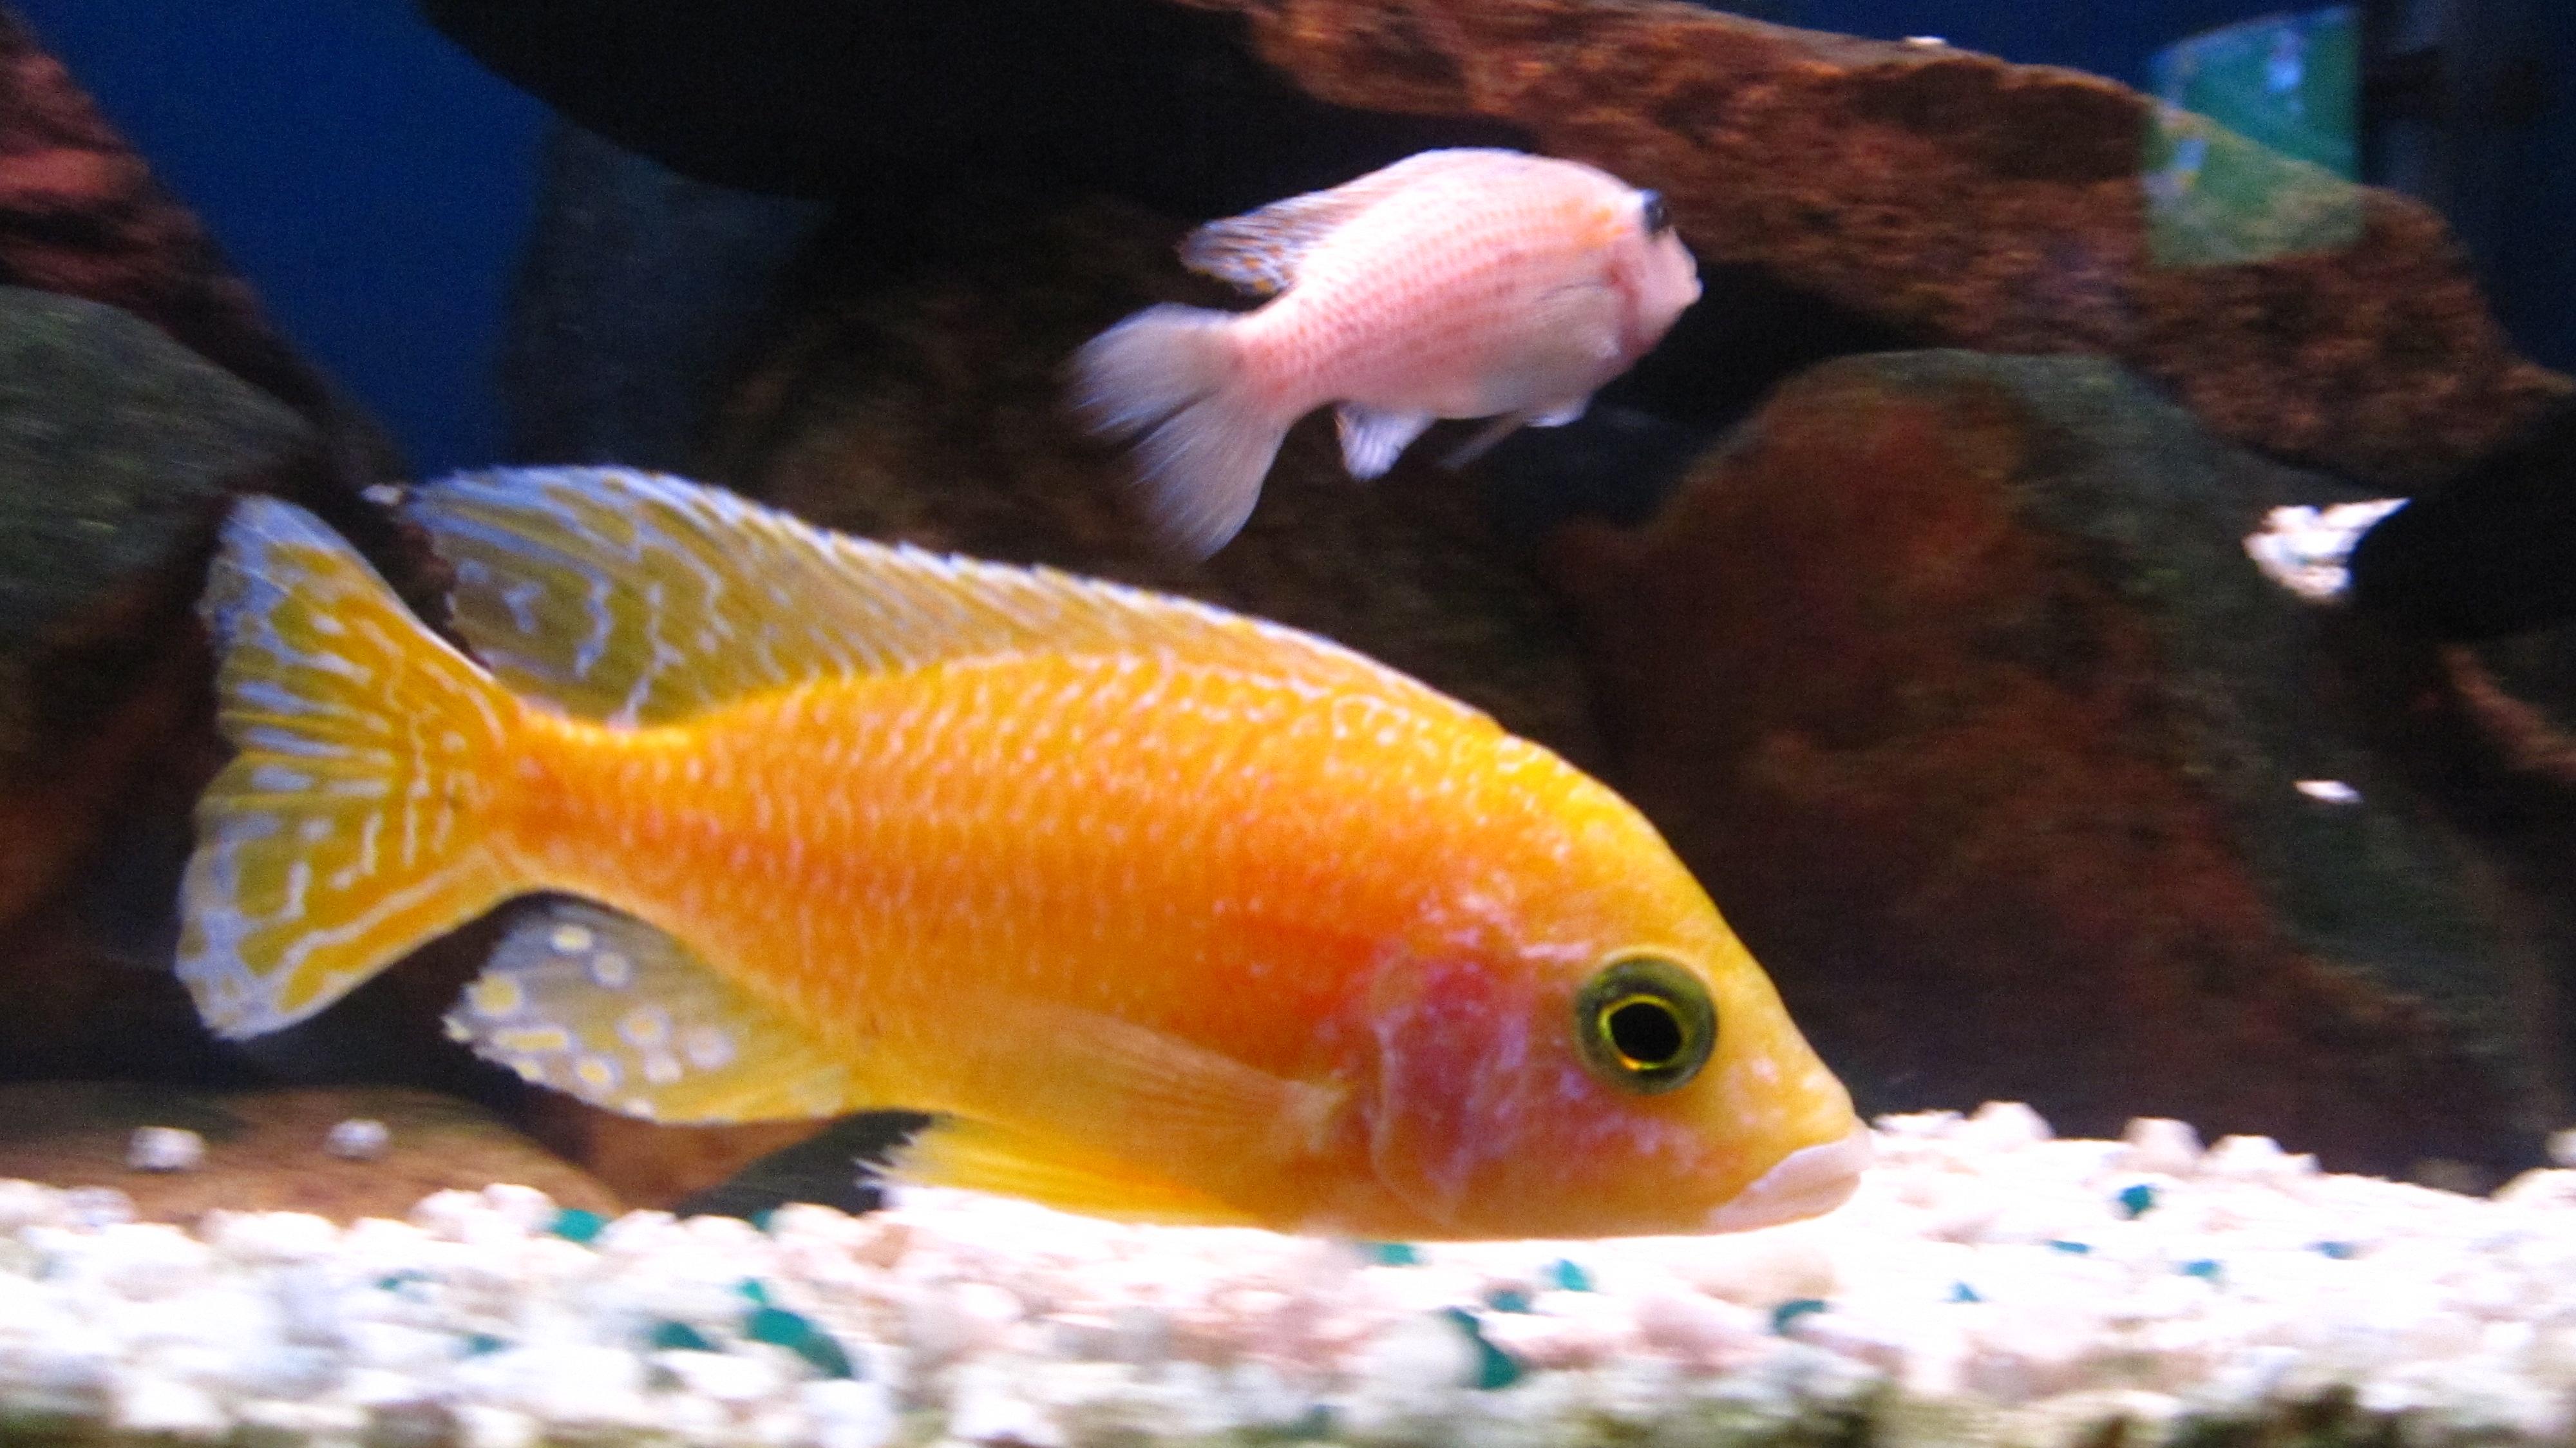 Dragon Blood Peacock Cichlid cichlids.com: gold pea...